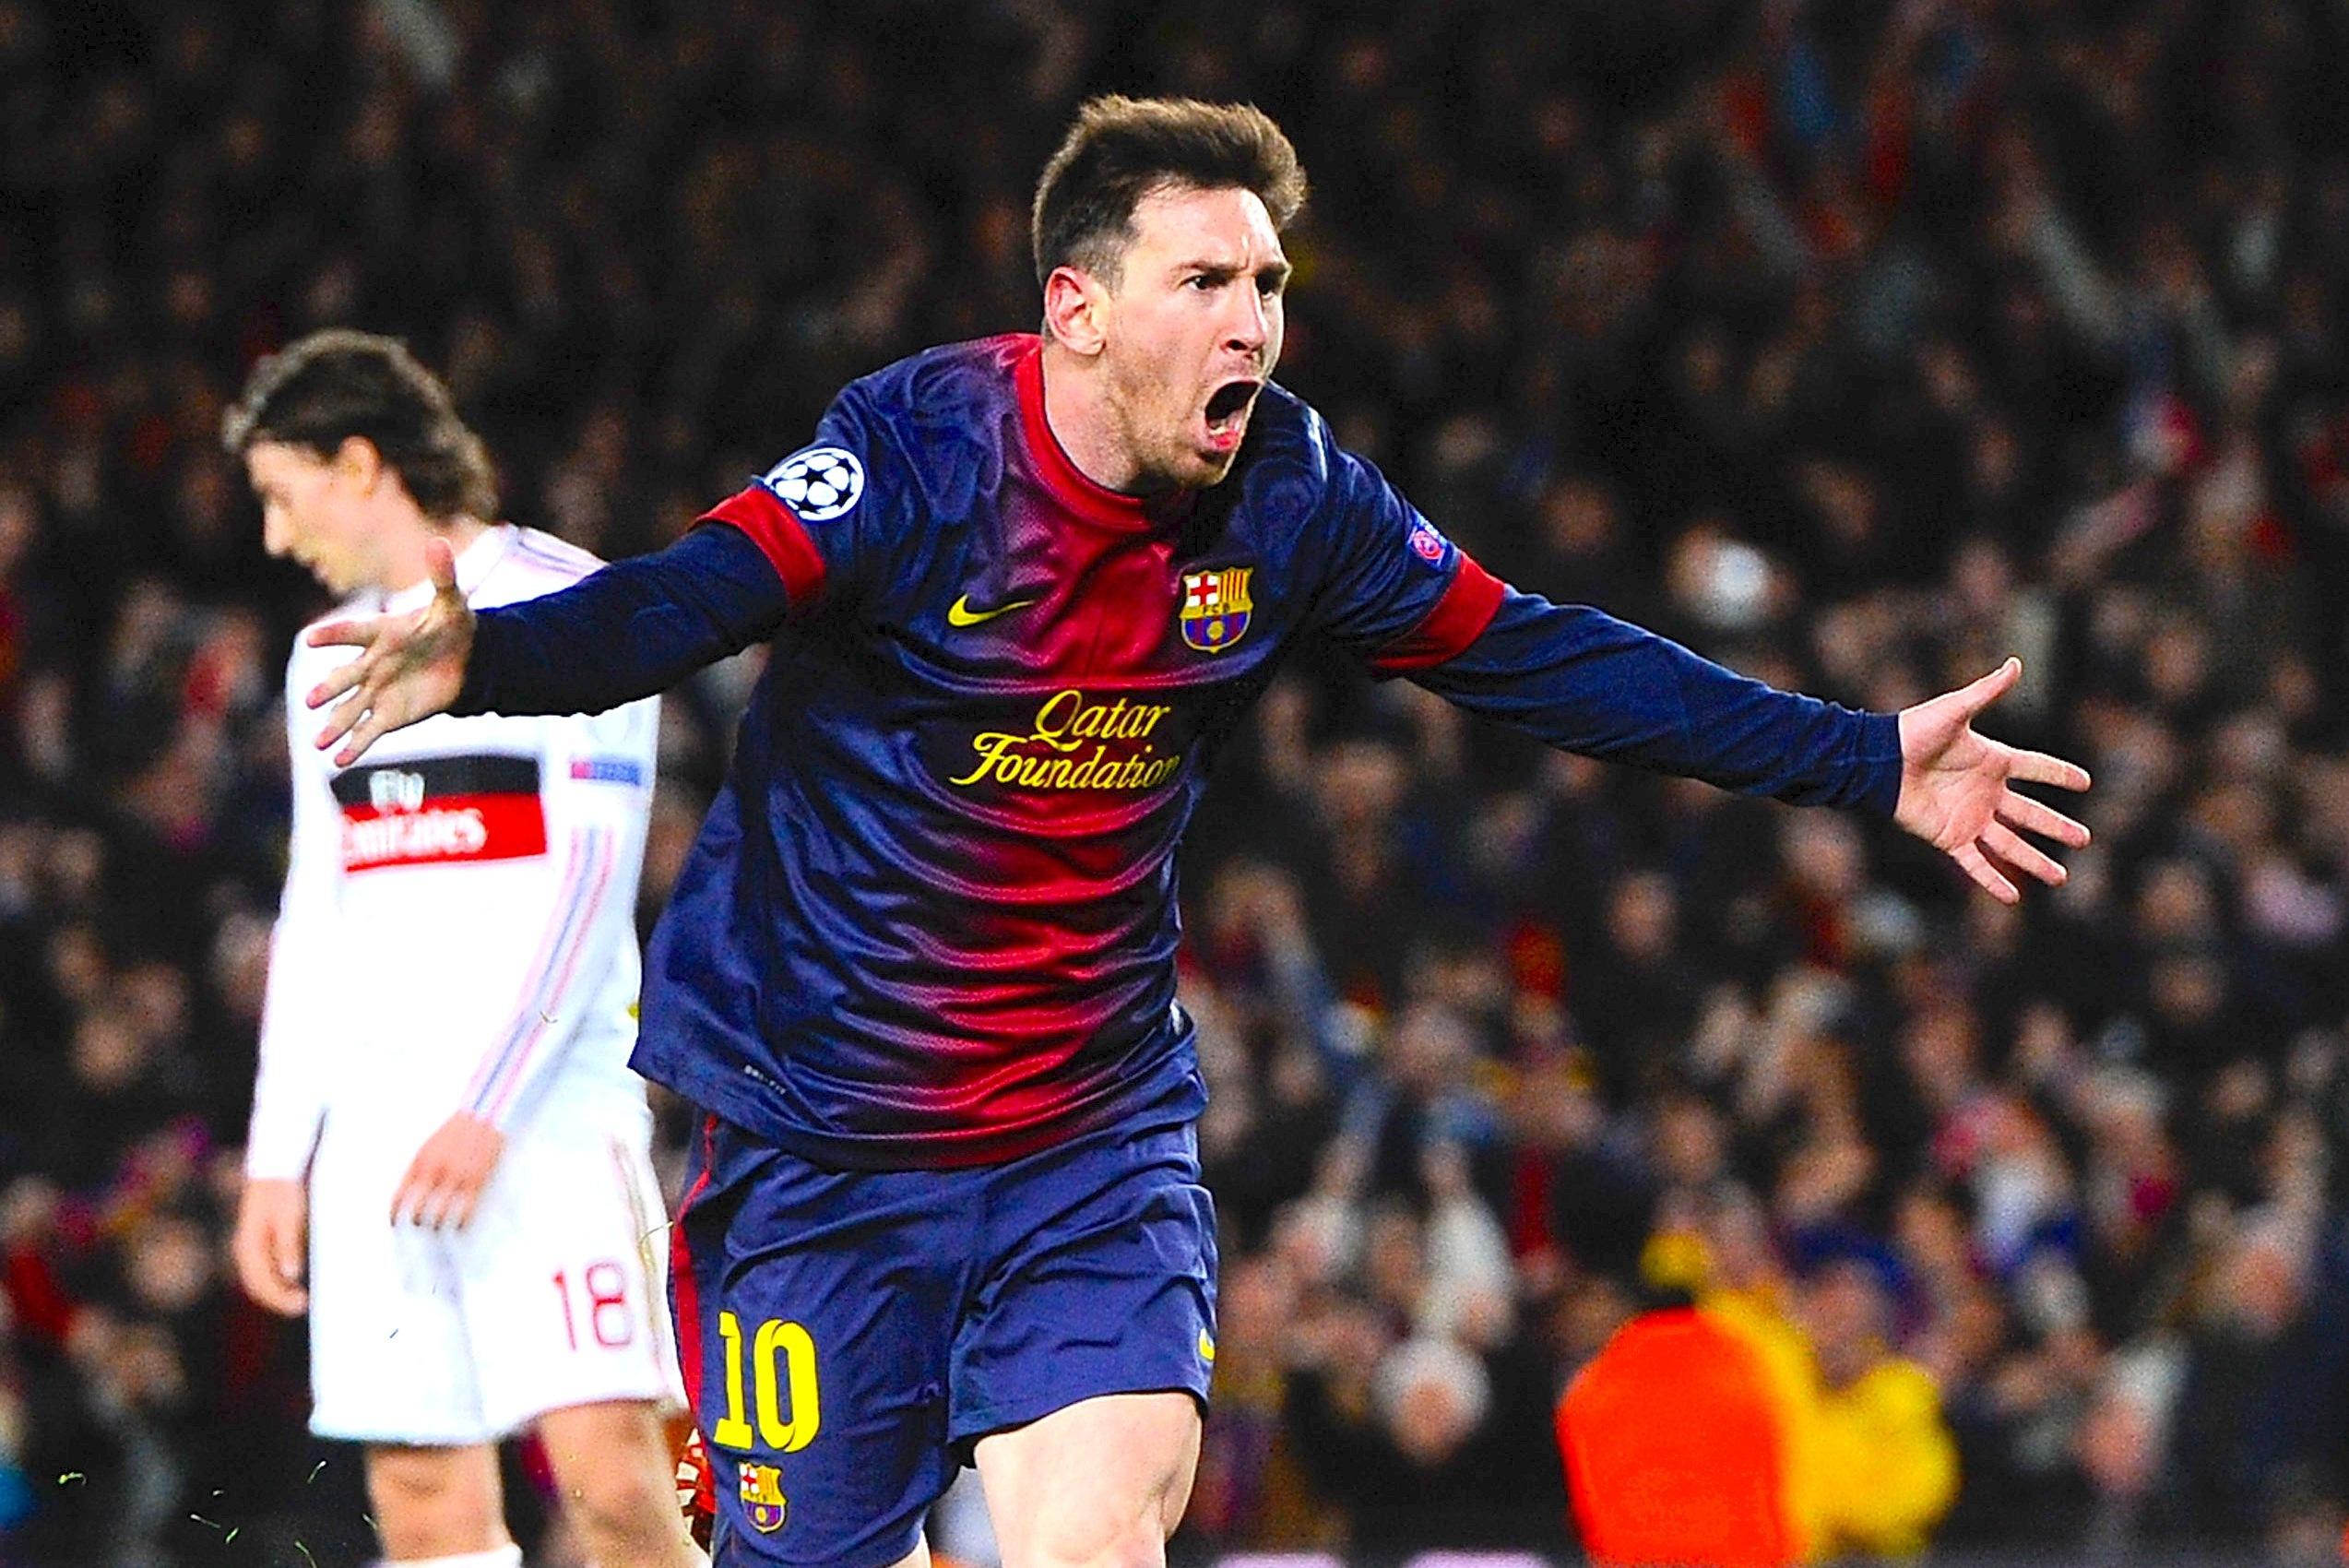 Barcelona Vs Ac Milan Score Grades And Post Match Reaction Bleacher Report Latest News Videos And Highlights